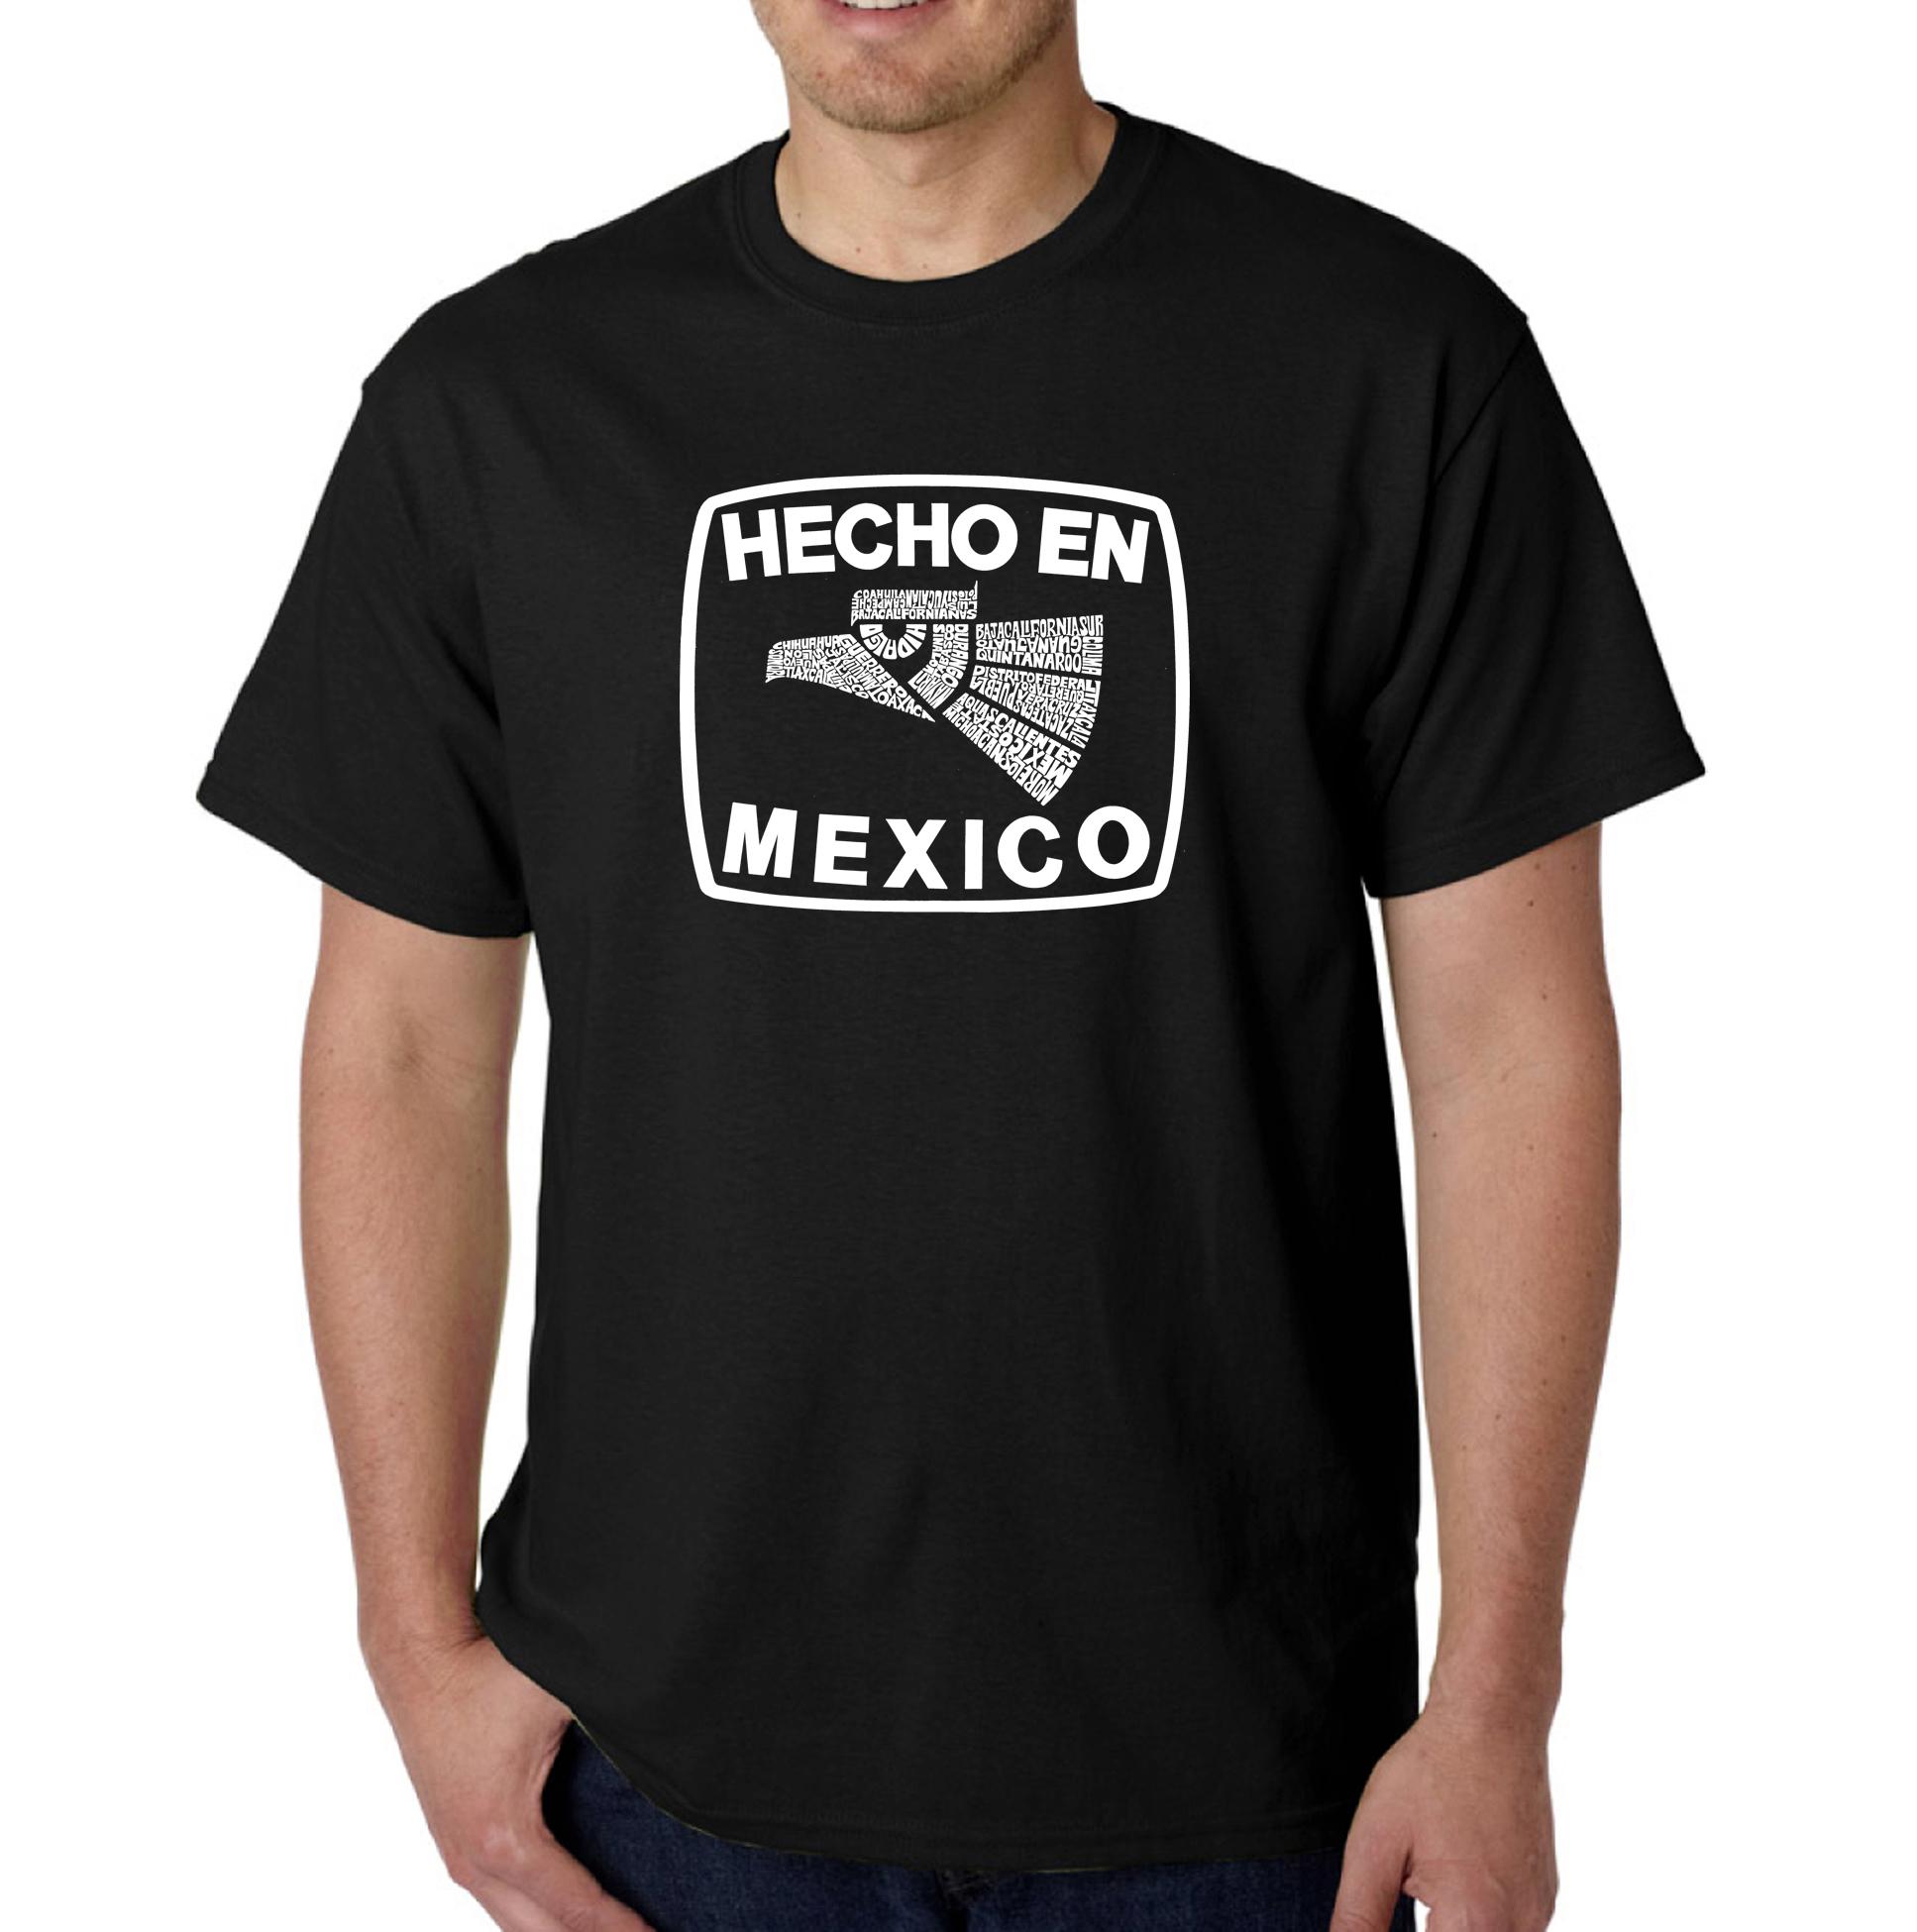 Los Angeles Pop Art Men's Word Art T-Shirt - Hecho En Mexico PartNumber: 3ZZVA77390612P MfgPartNumber: XMEXICOBlackL